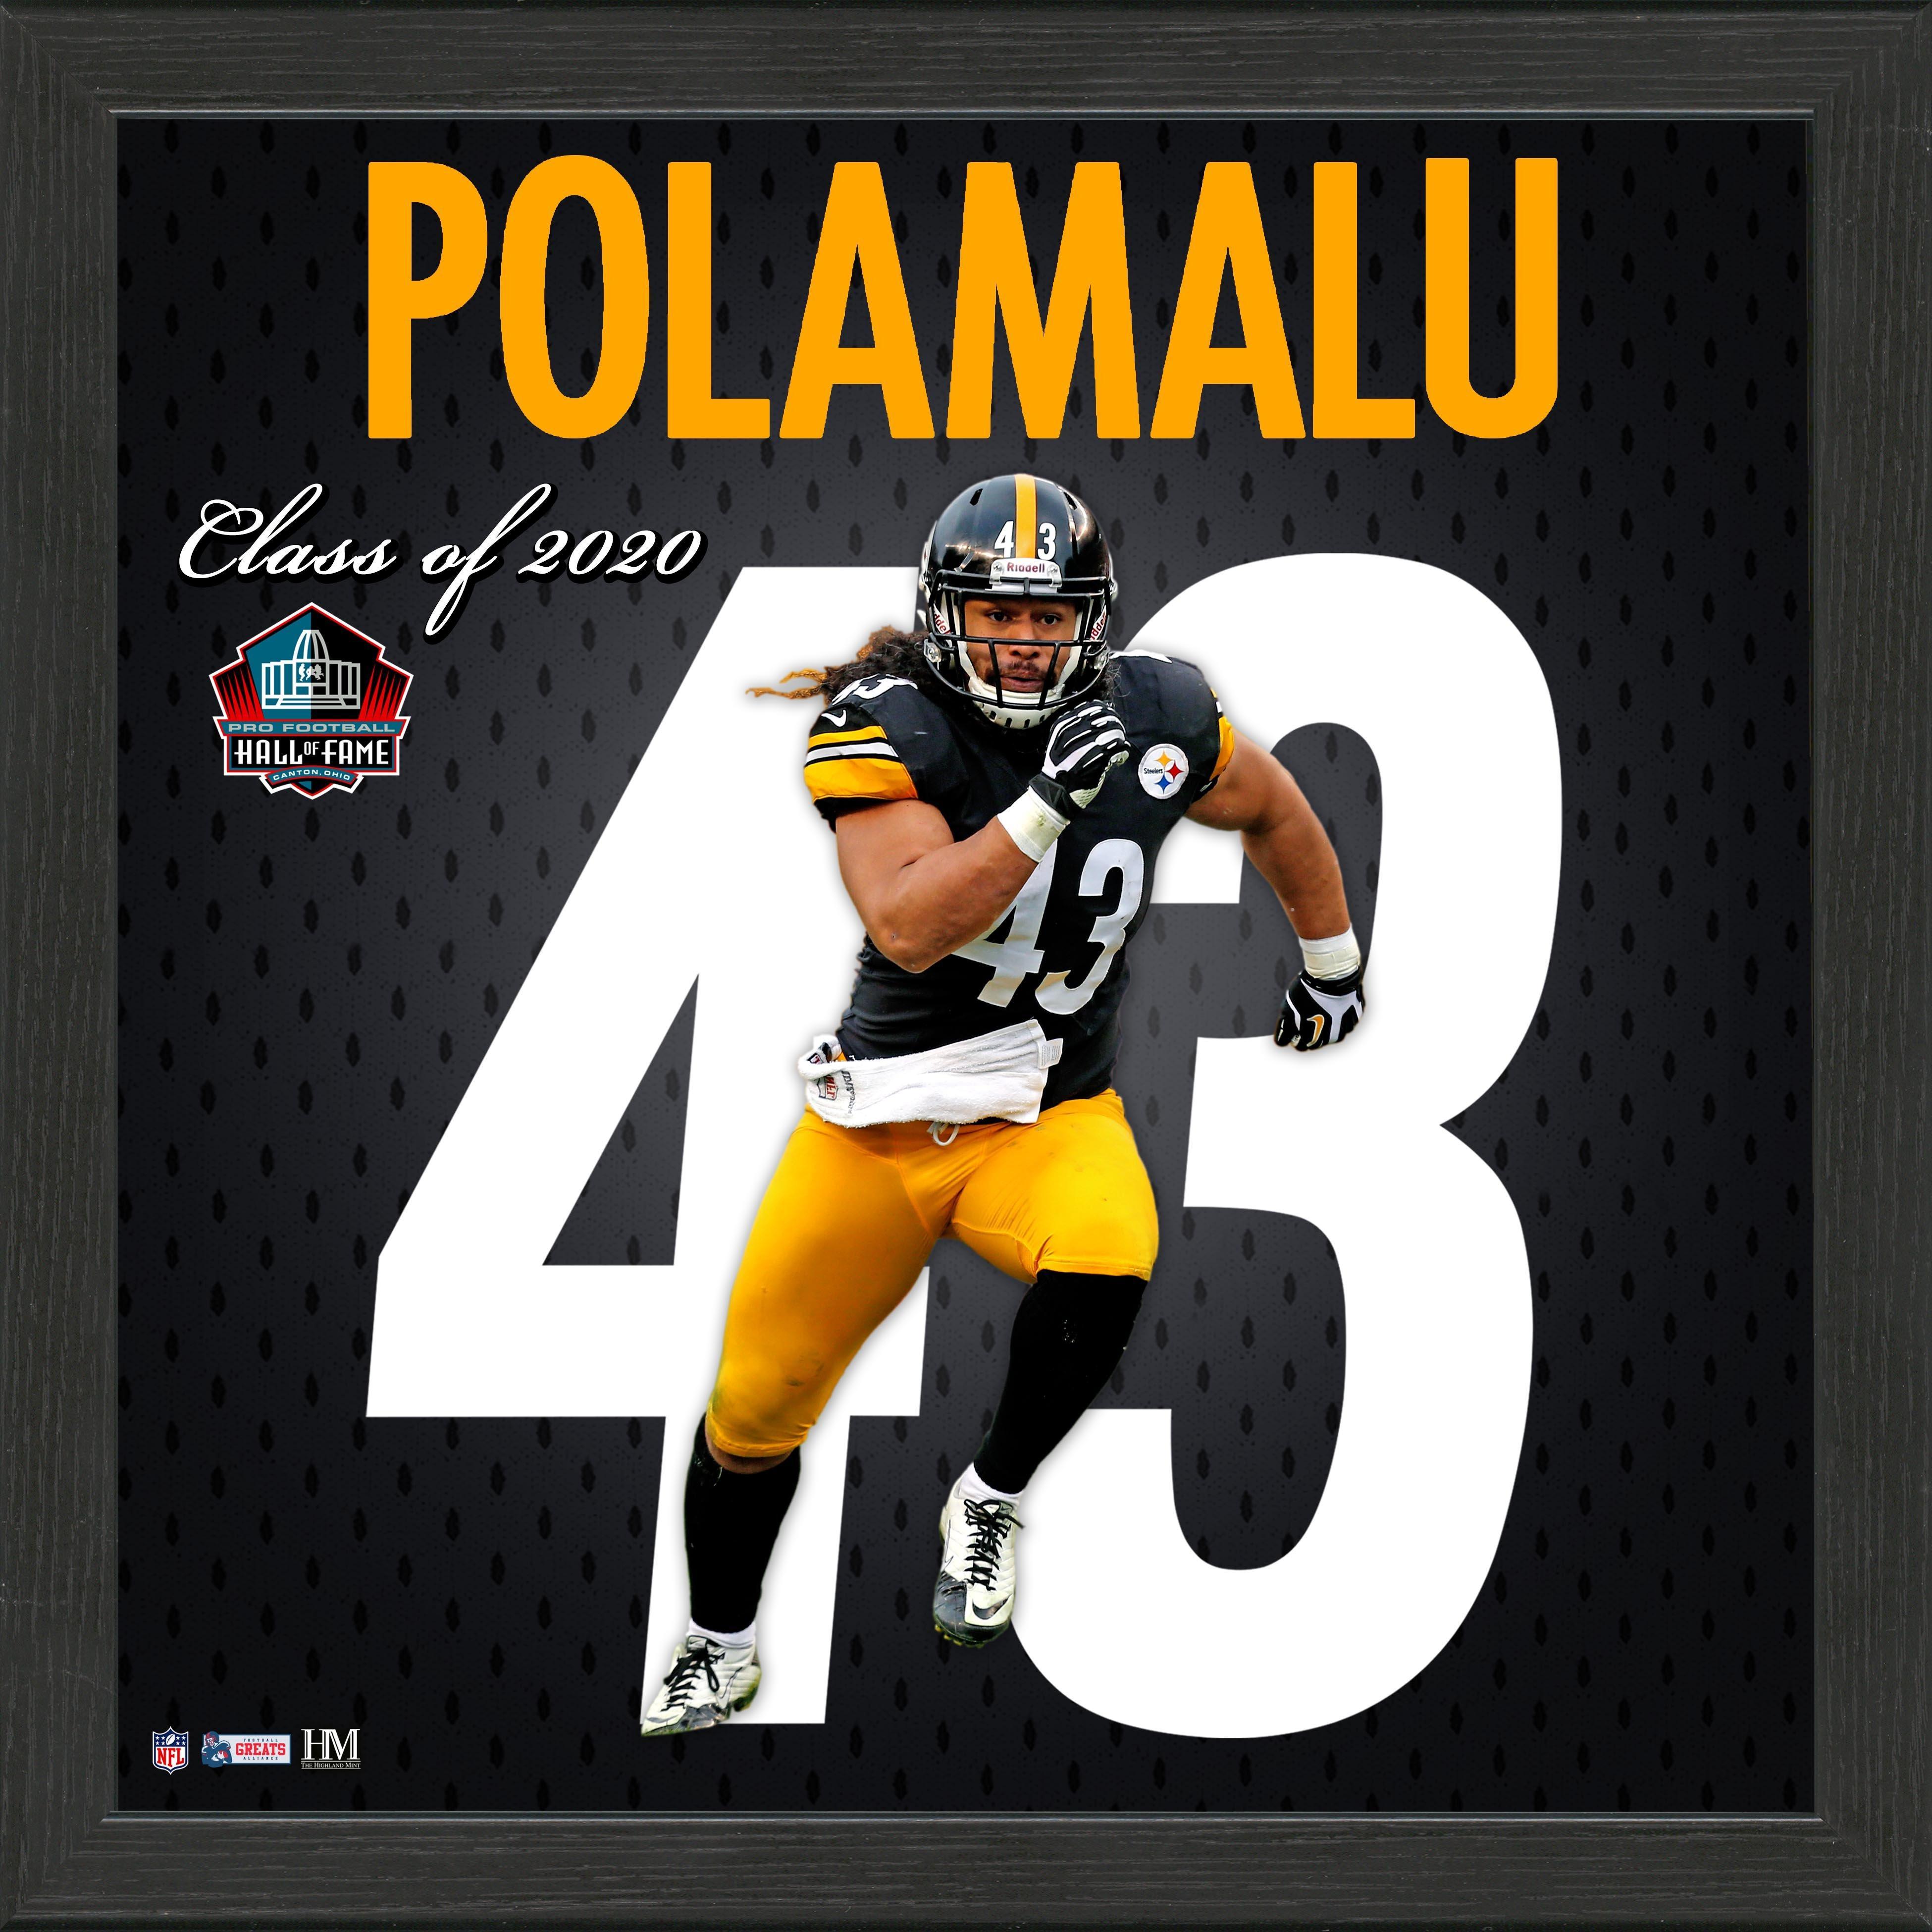 Pittsburgh Steelers Troy Polamalu Jersey Number Framed Photo | GameStop